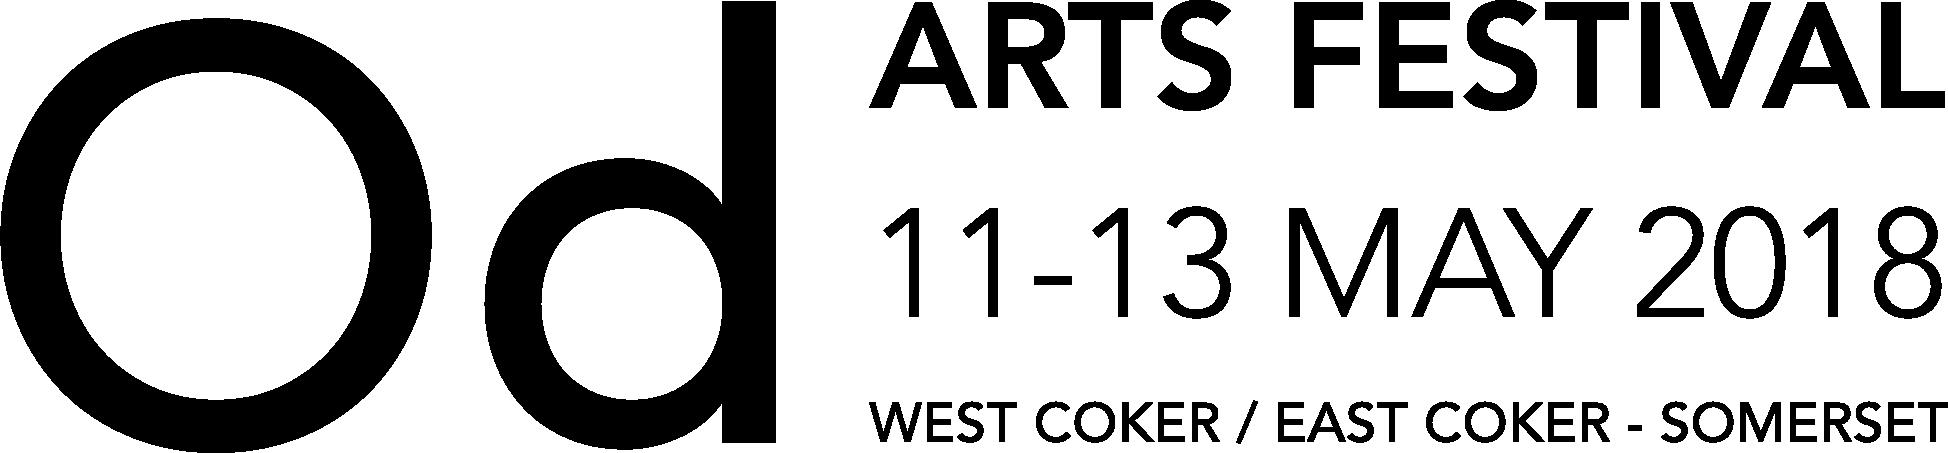 OD-logo-black